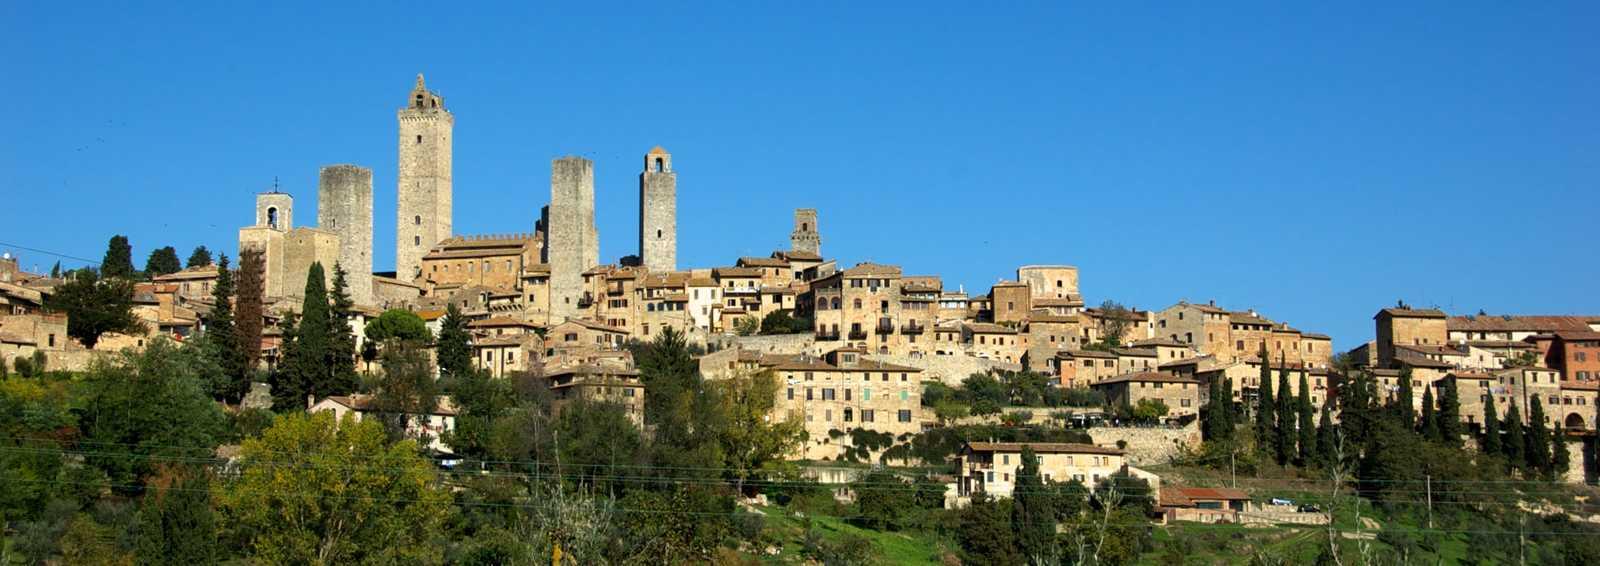 Headwater - Volterra to San Gimignano Self-Guided Walk | Exodus